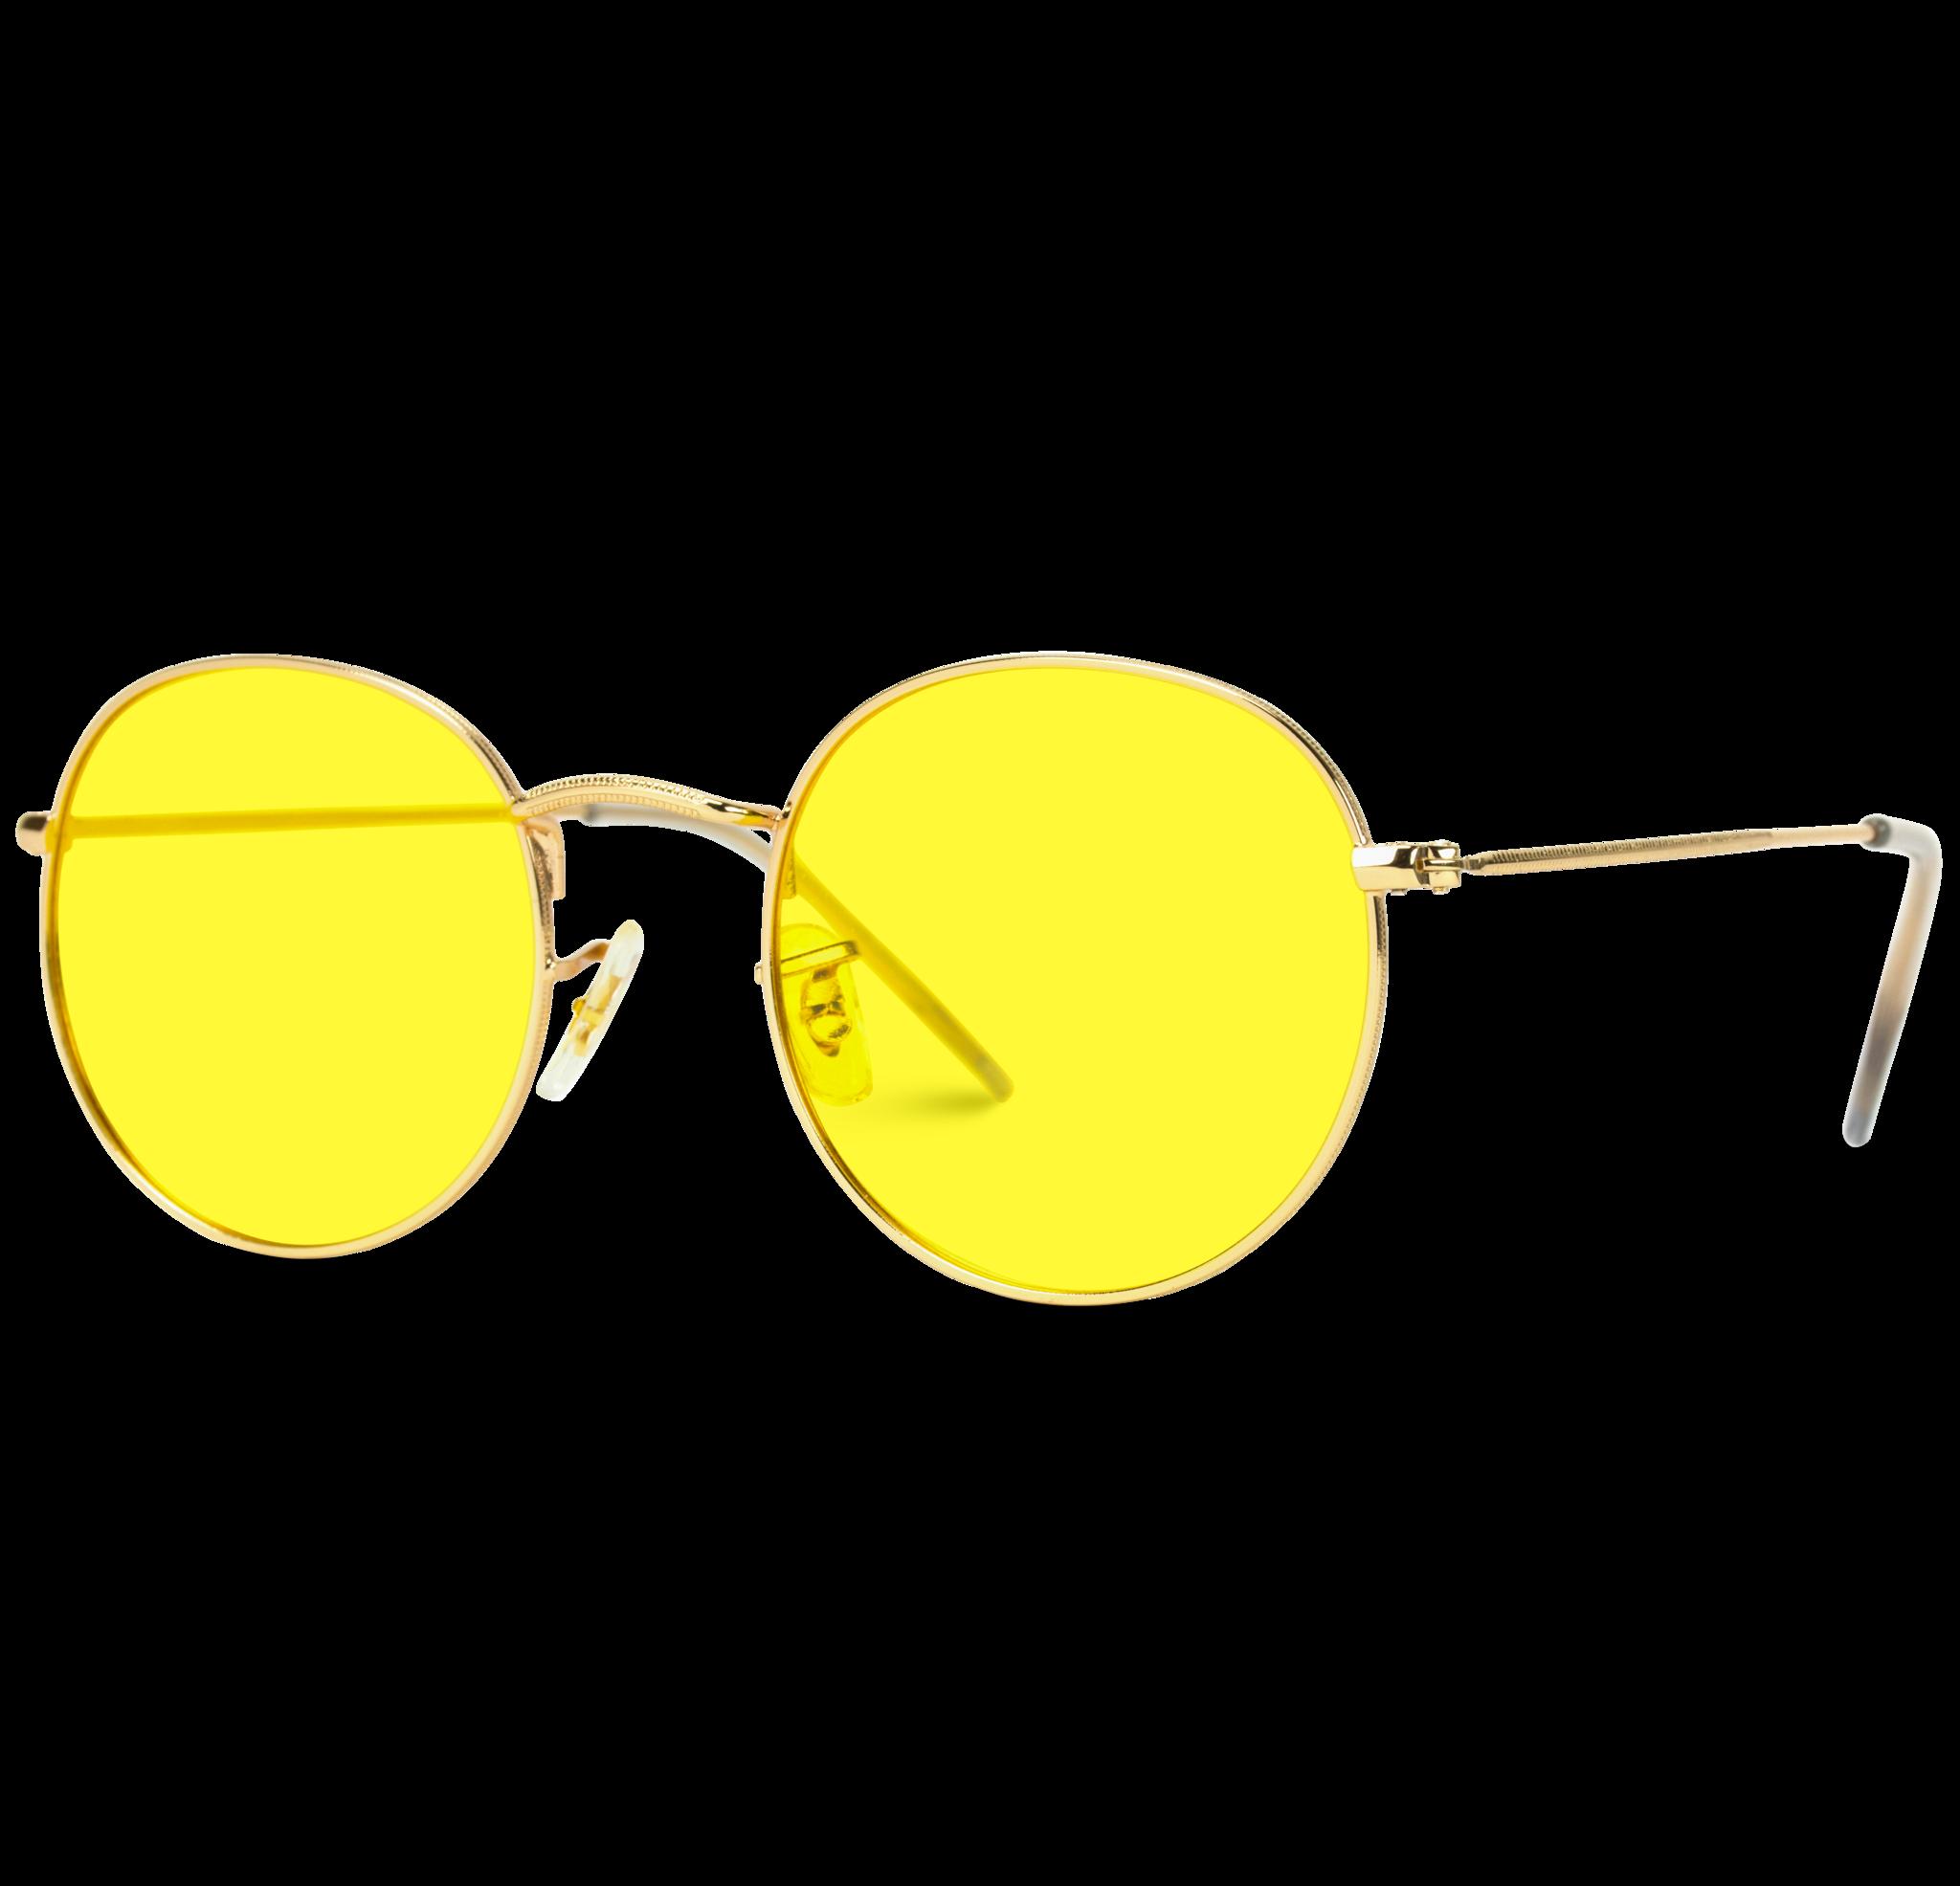 Ode Round Tinted Polarized Lens Metal Frame Retro Sunglasses Retro Sunglasses Yellow Lens Sunglasses Polarized Lens